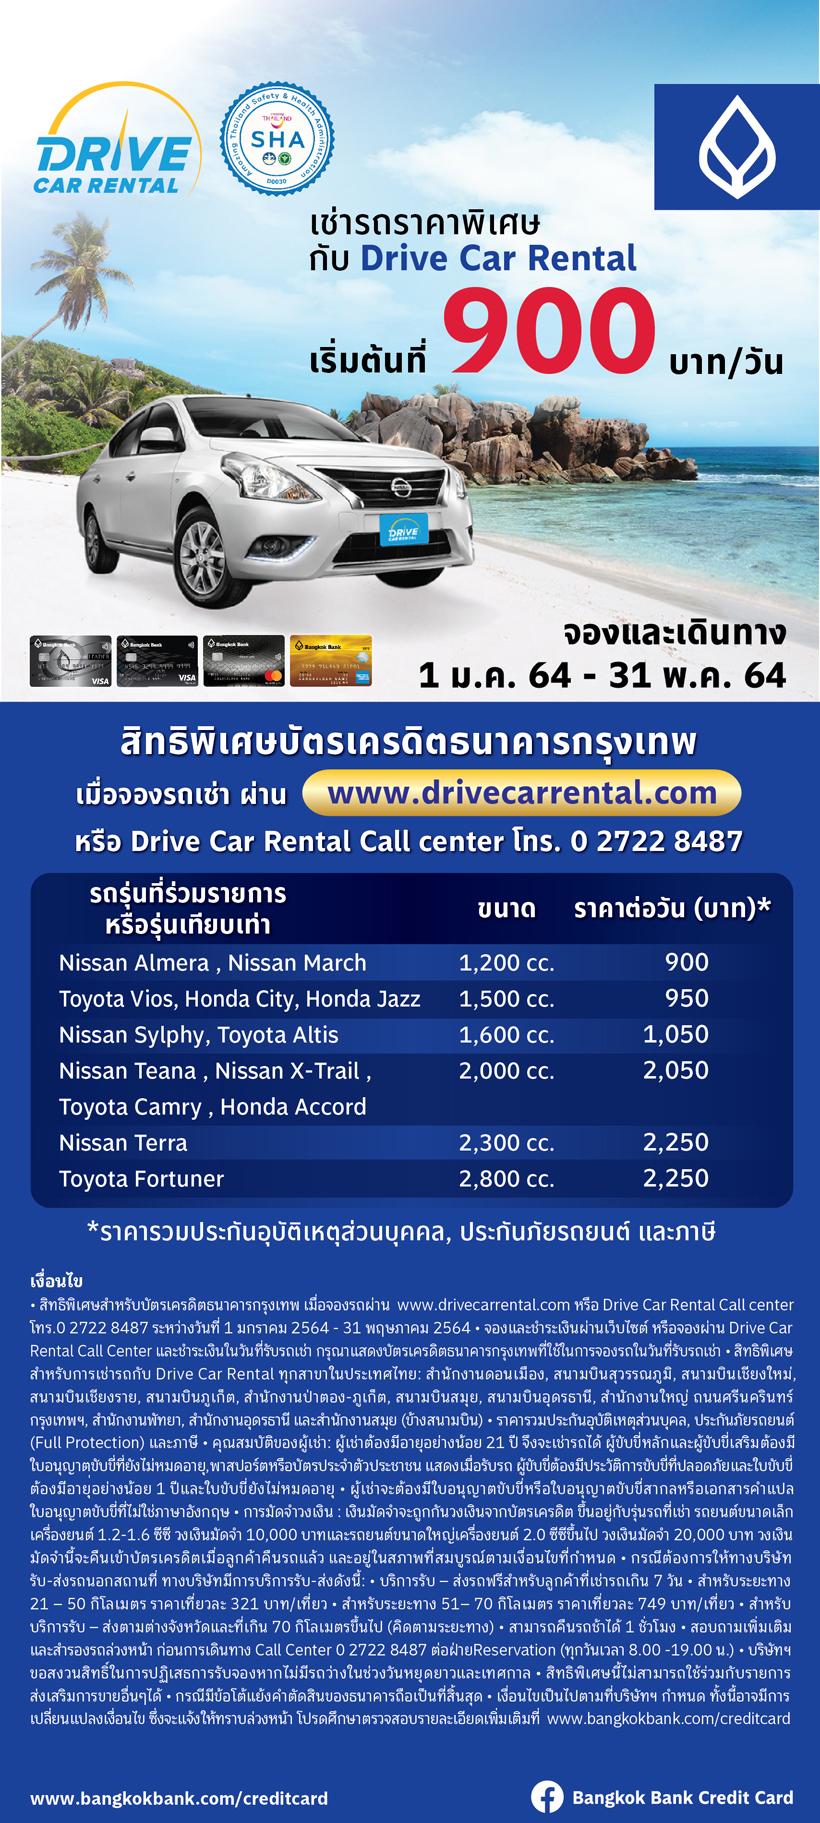 Promotion-2021-BBL-Drive-car-rental-bangkok-bank